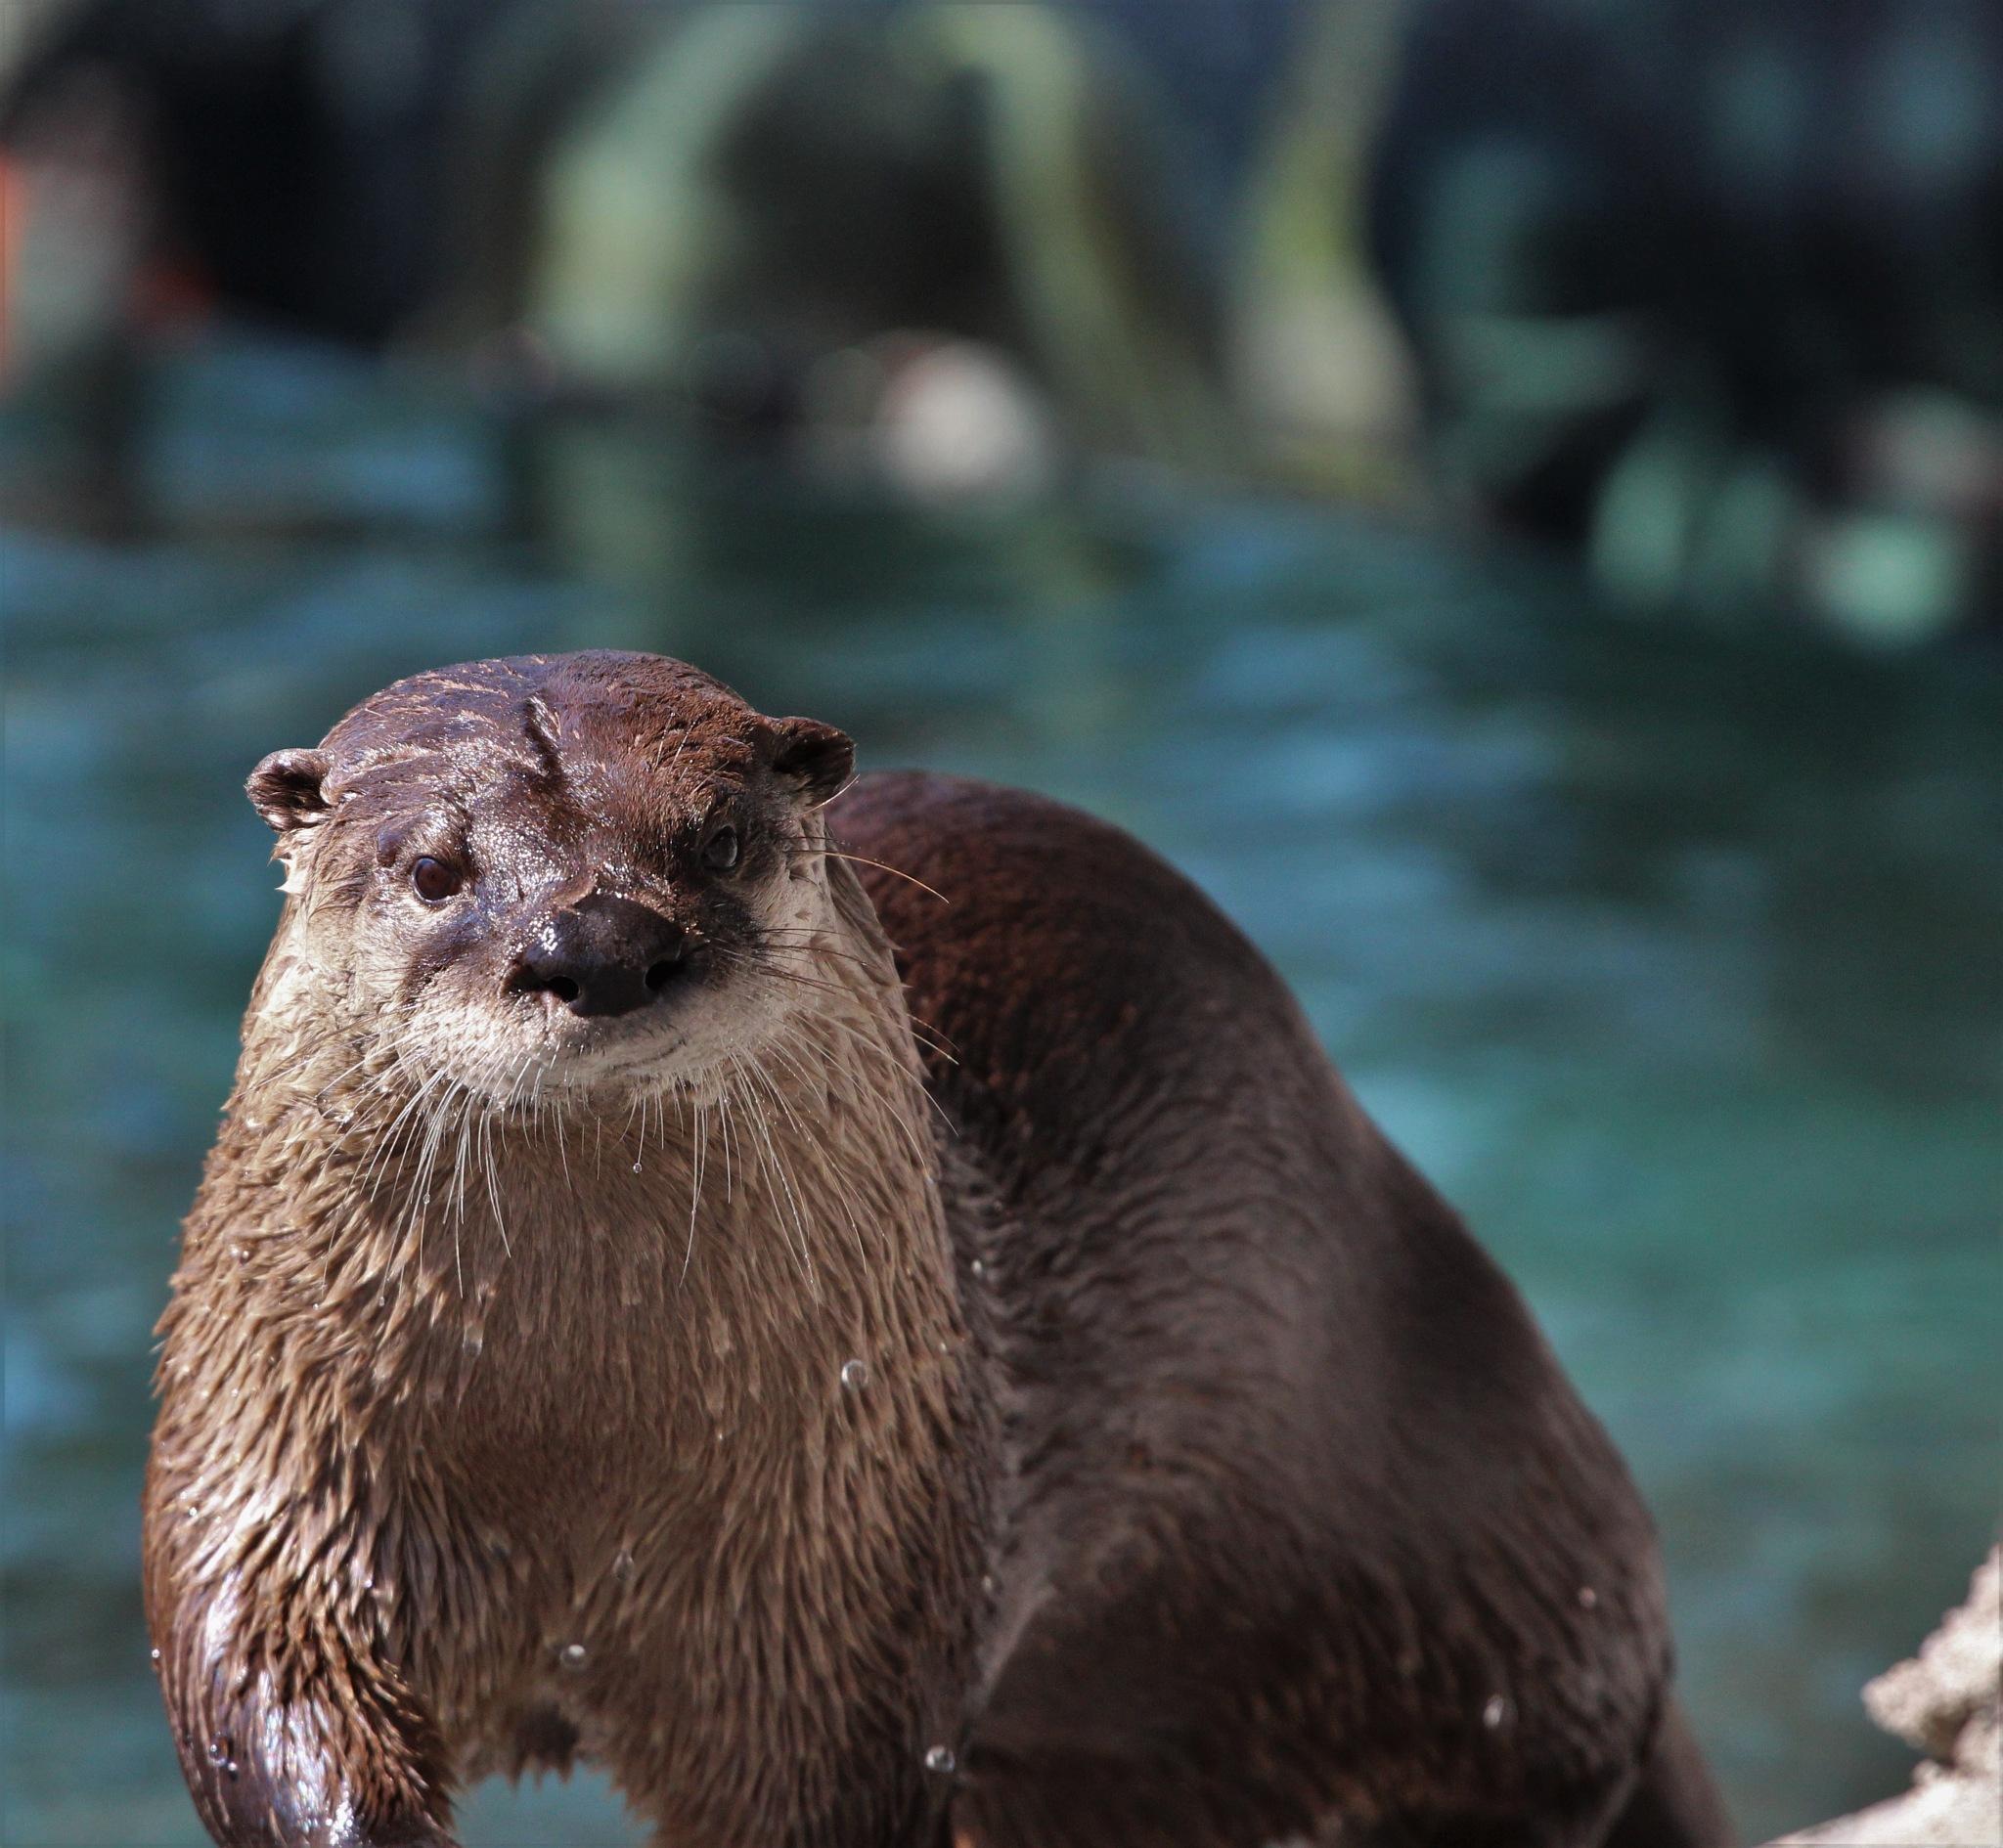 River otter by George Keller